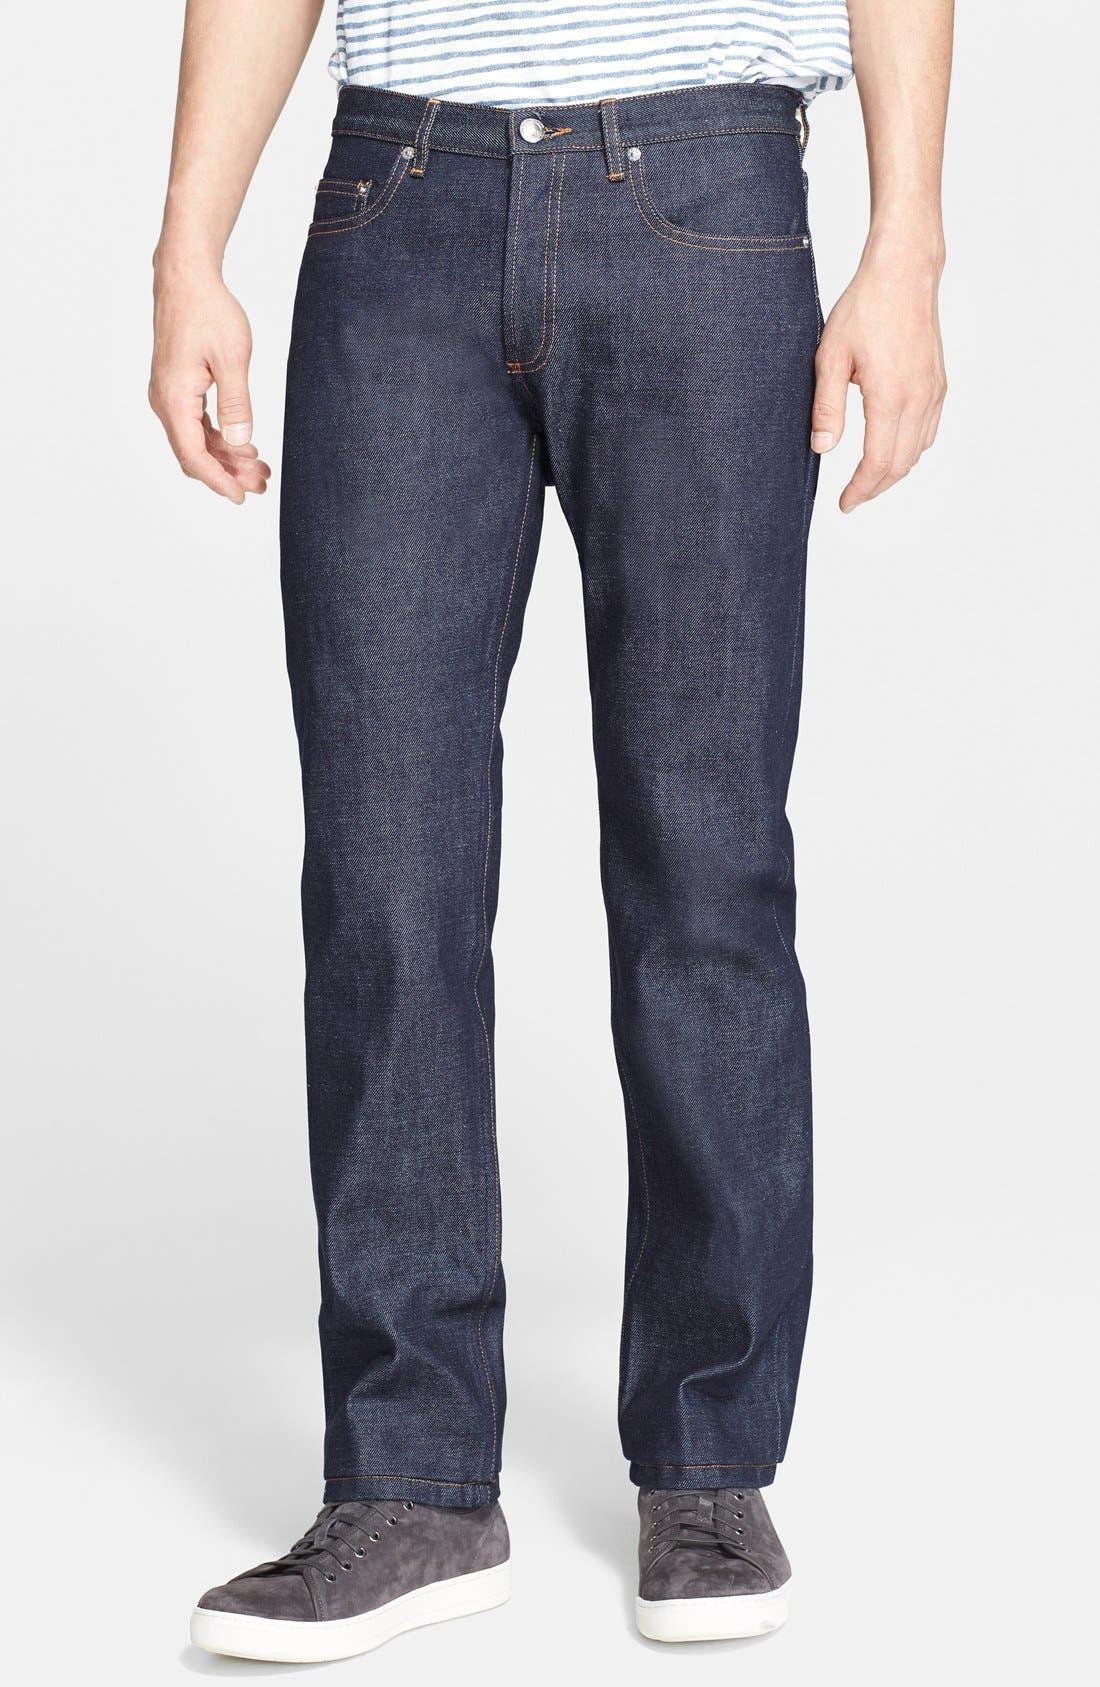 New Standard Slim Straight Leg Raw Selvedge Jeans,                             Main thumbnail 1, color,                             INDIGO WASH